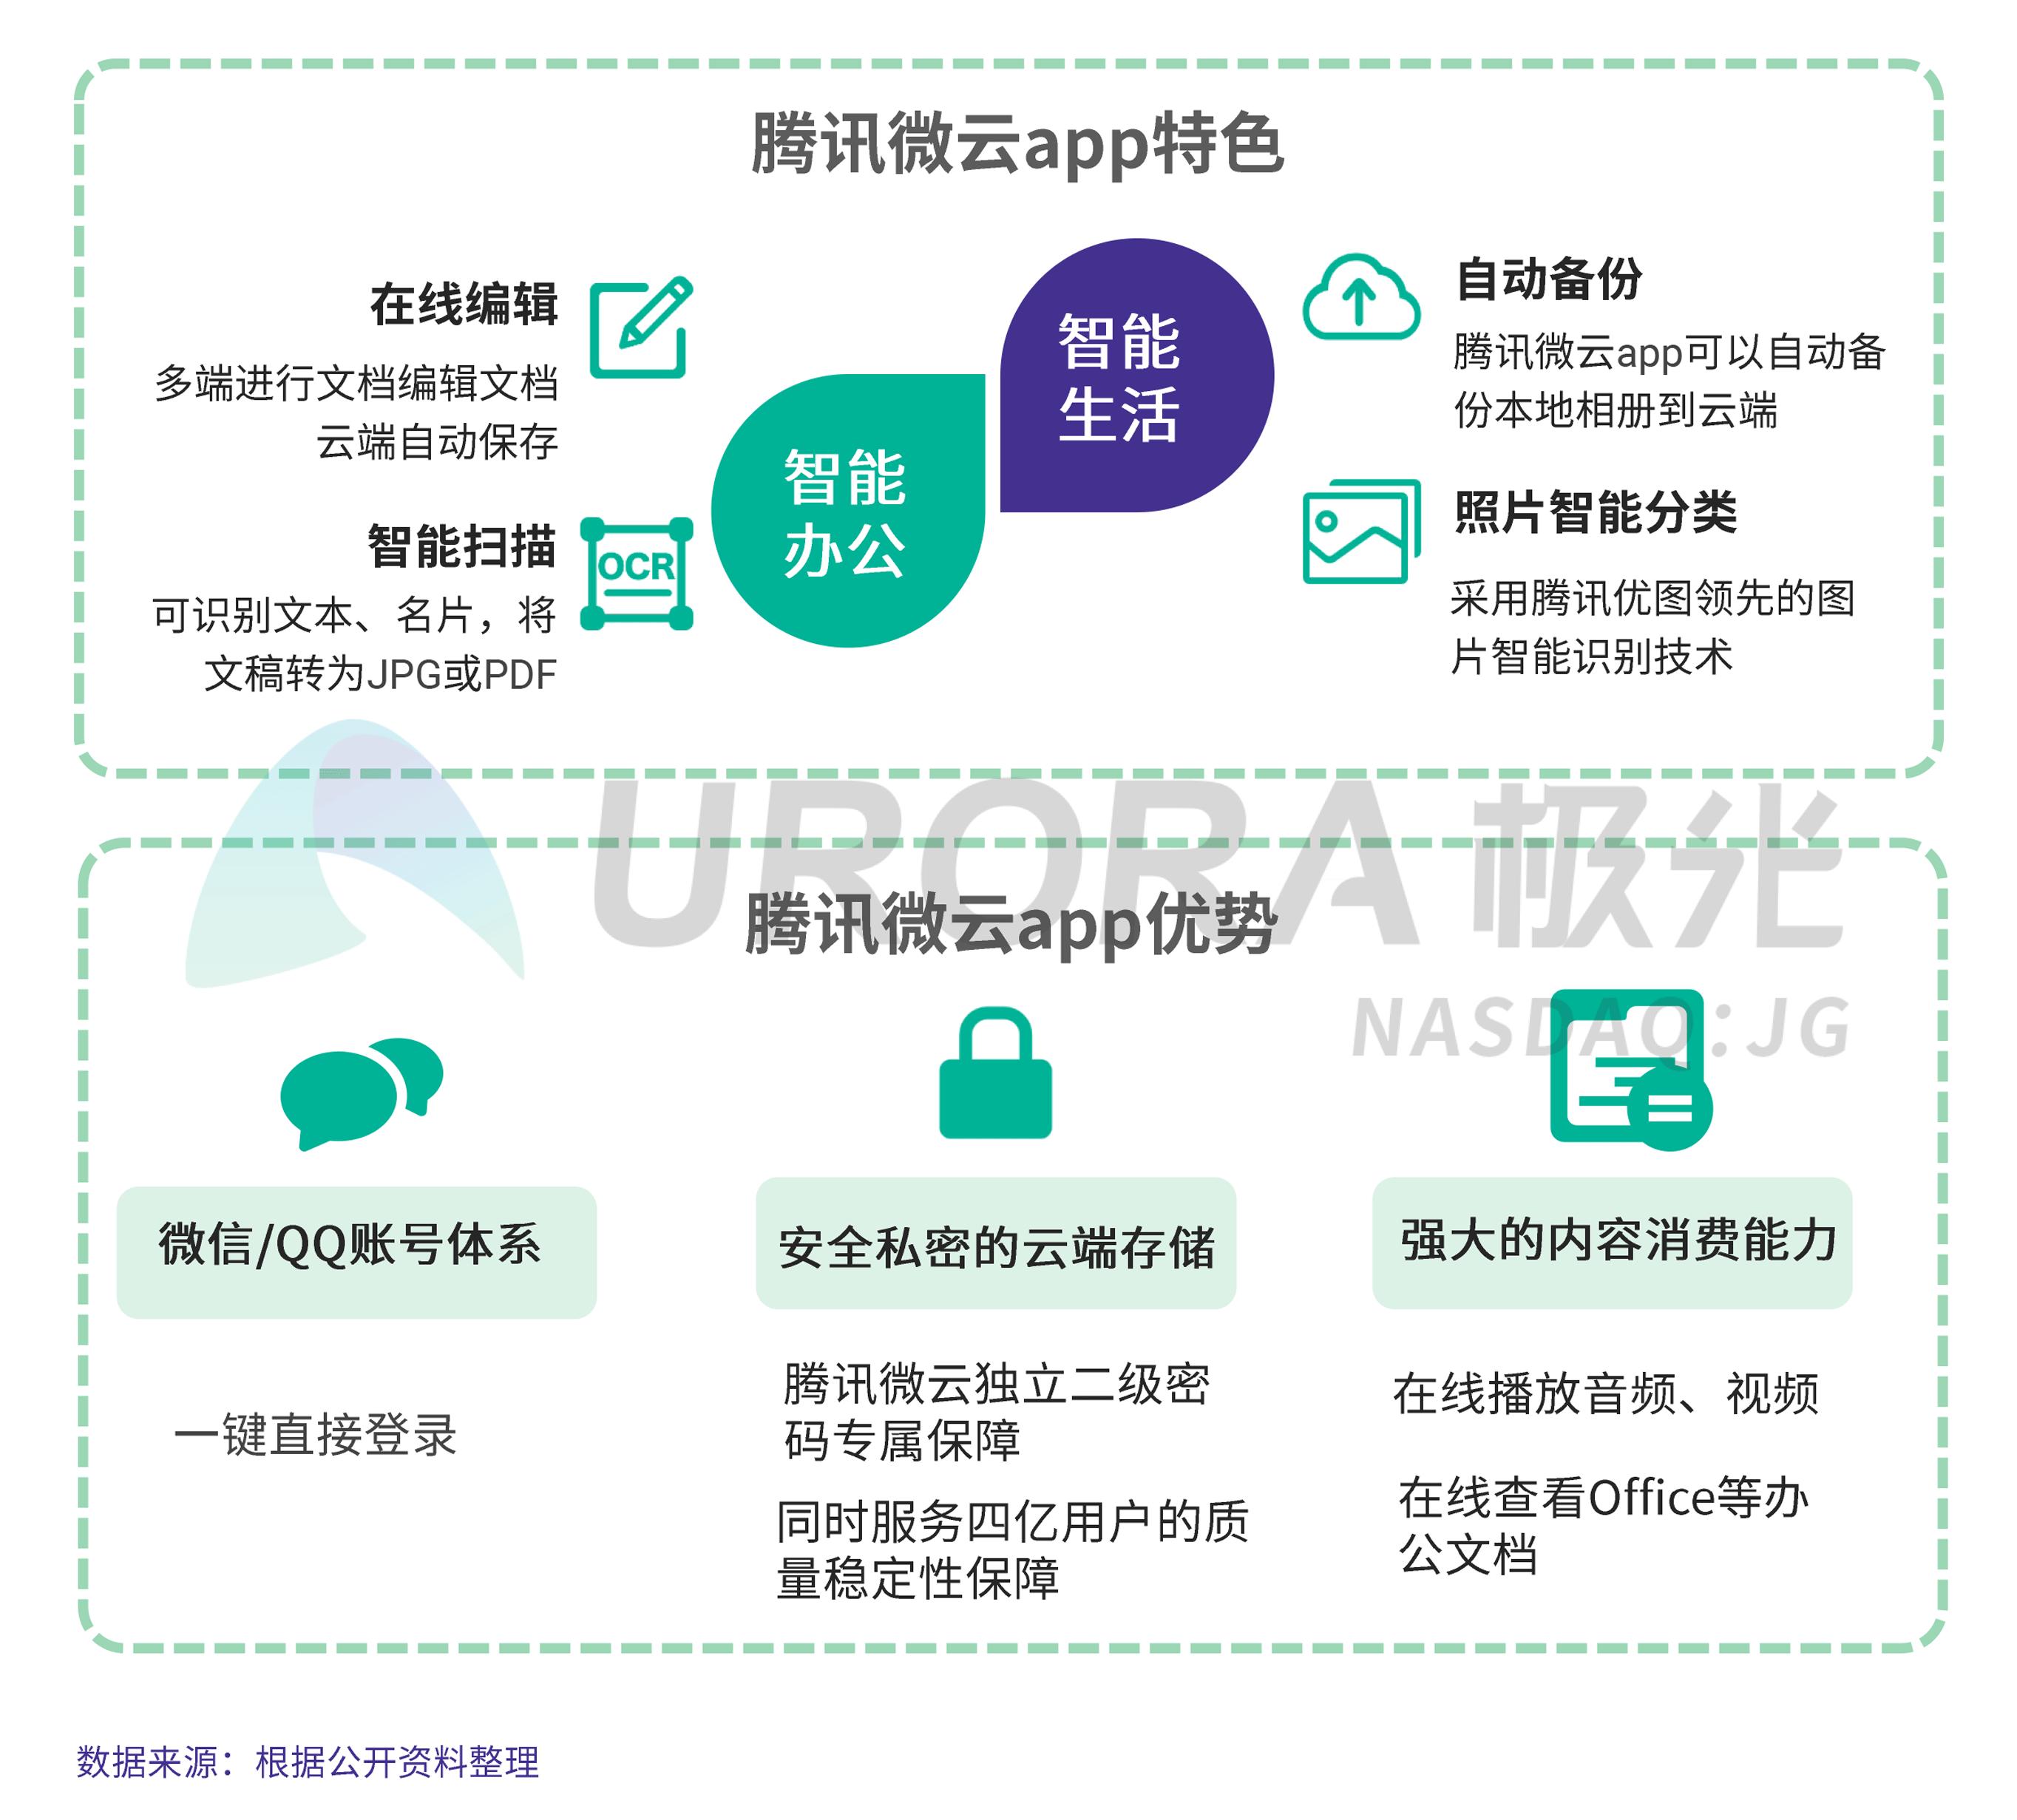 JIGUANG-个人网盘行业研究报告-final---切图版2-29.png